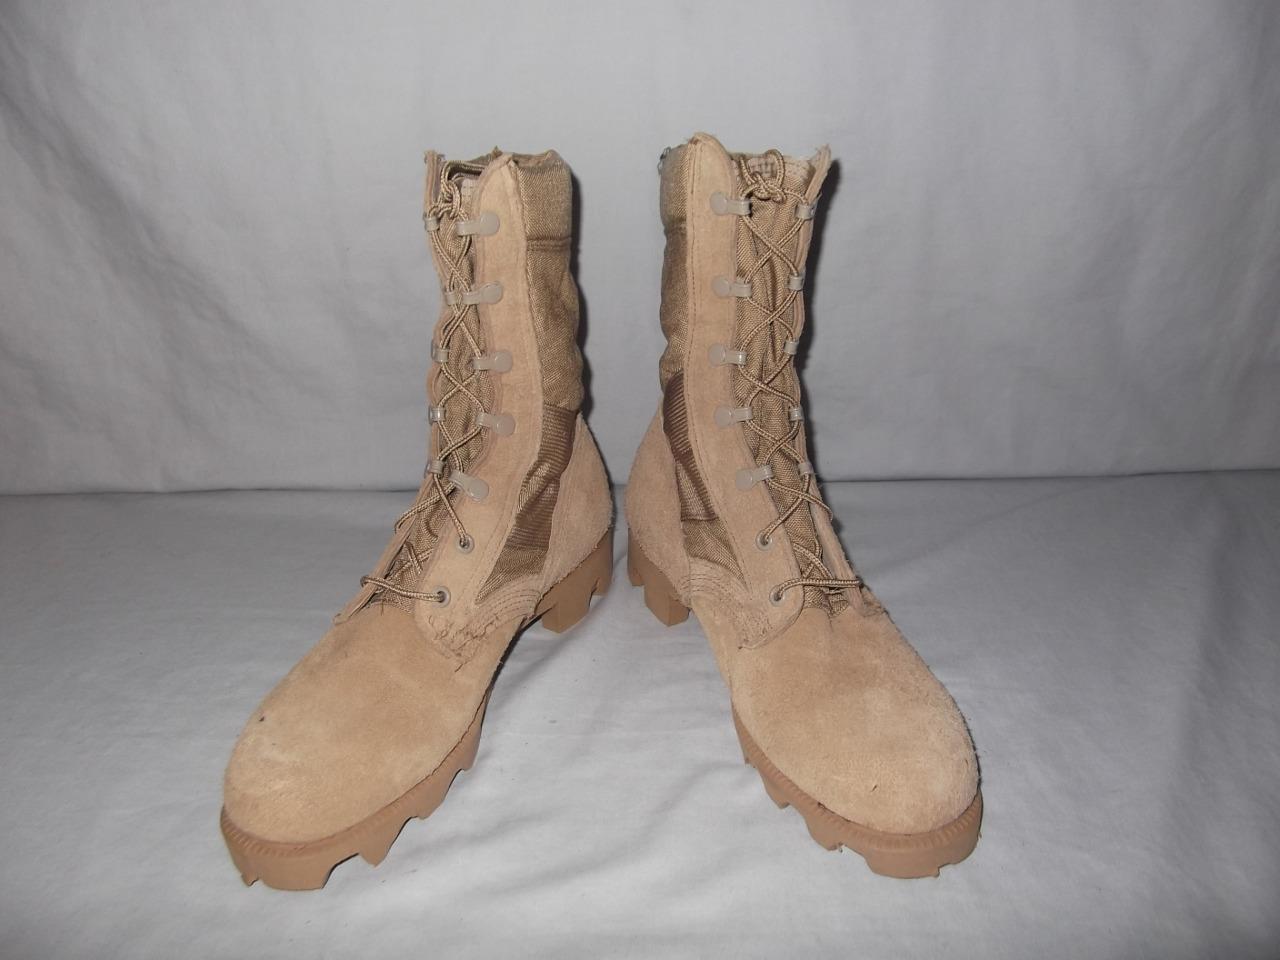 Military Stiefel 7 N Desert Tan Hot Weather US Army Hunt Work Men Boys  29